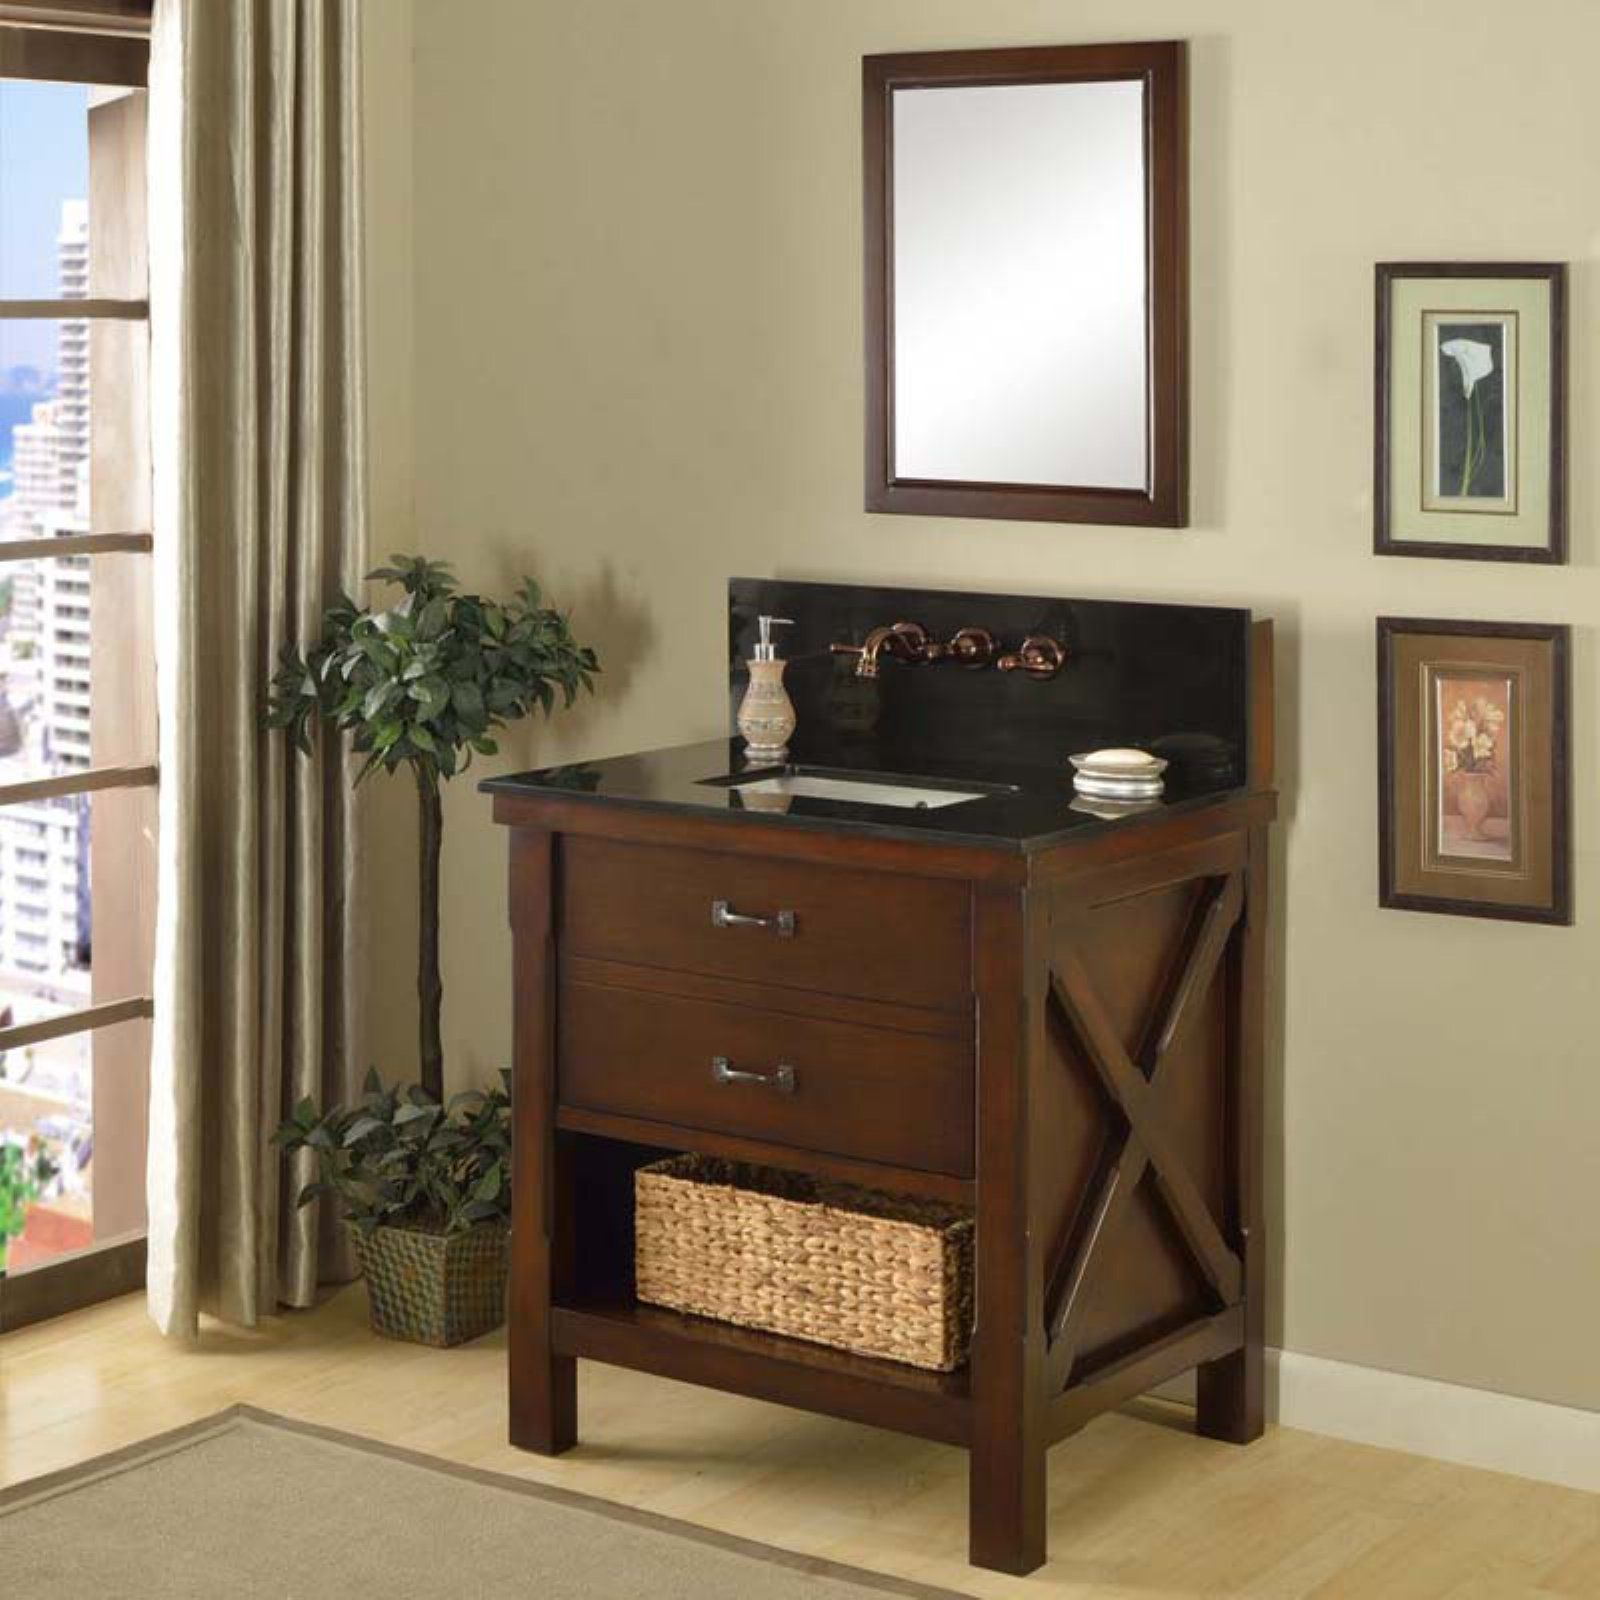 Direct Vanity Sink Xtraordinary Spa Premium 32s1 32 In Single